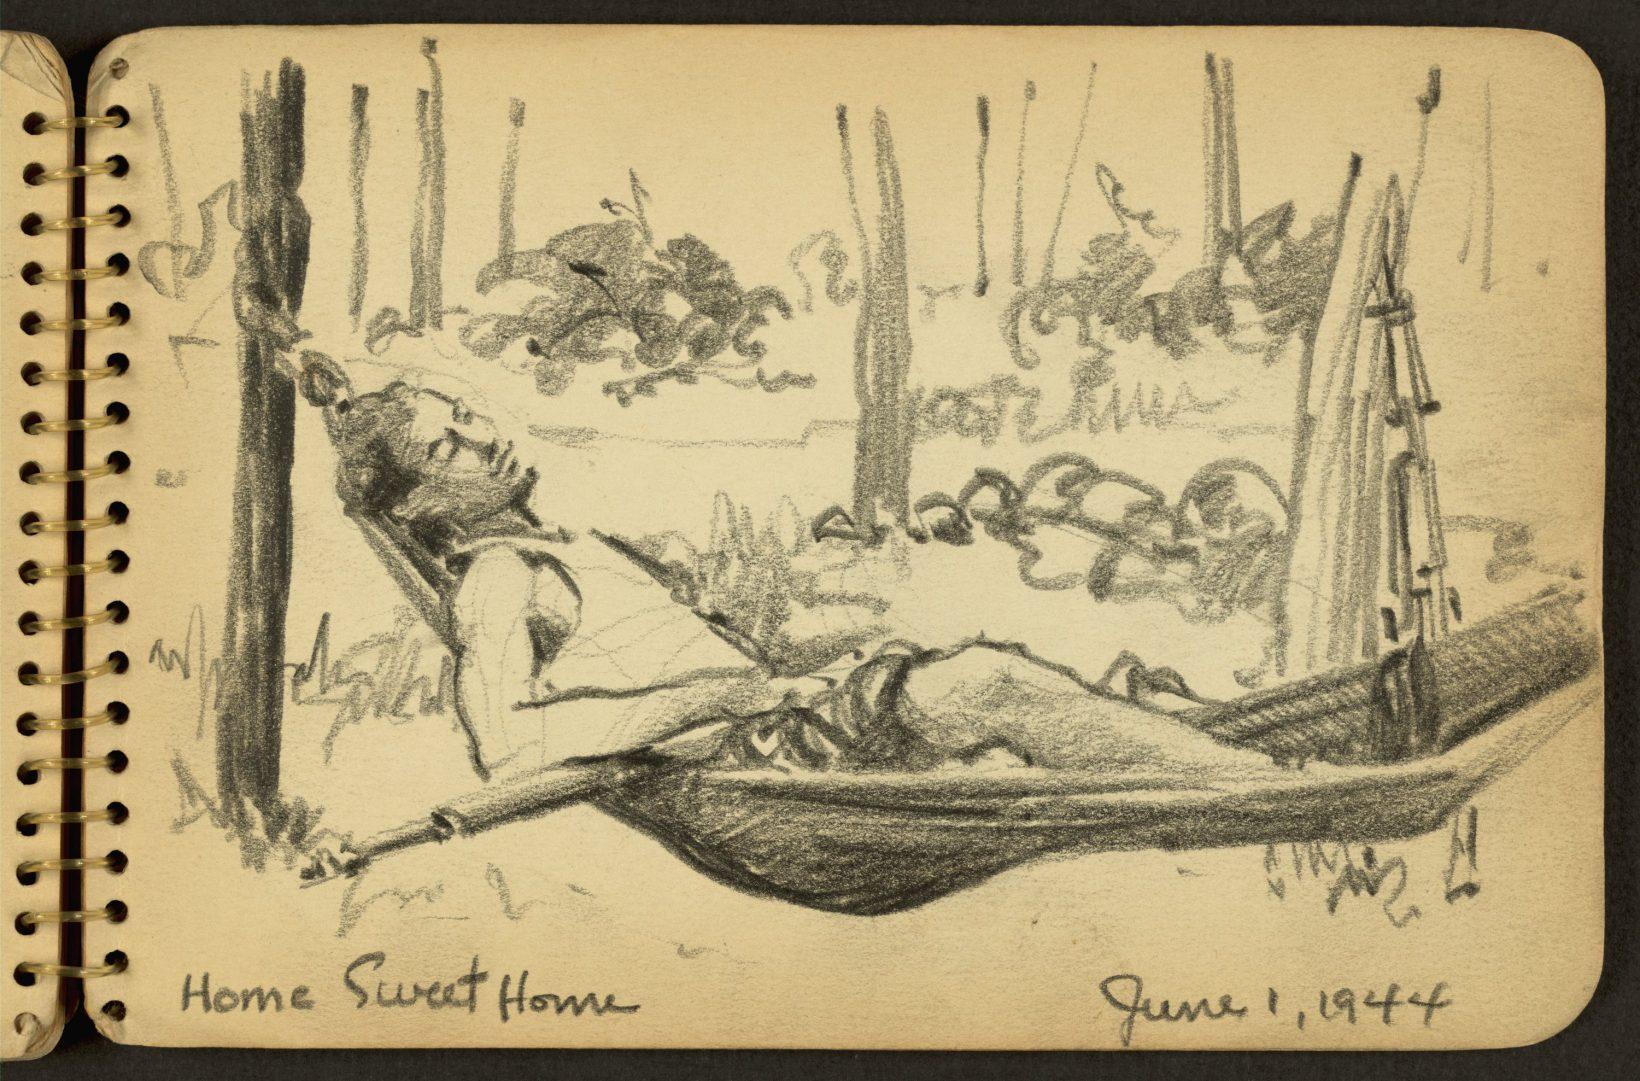 victor-lundy-carnet-croquis-seconde-guerre-mondiale-14